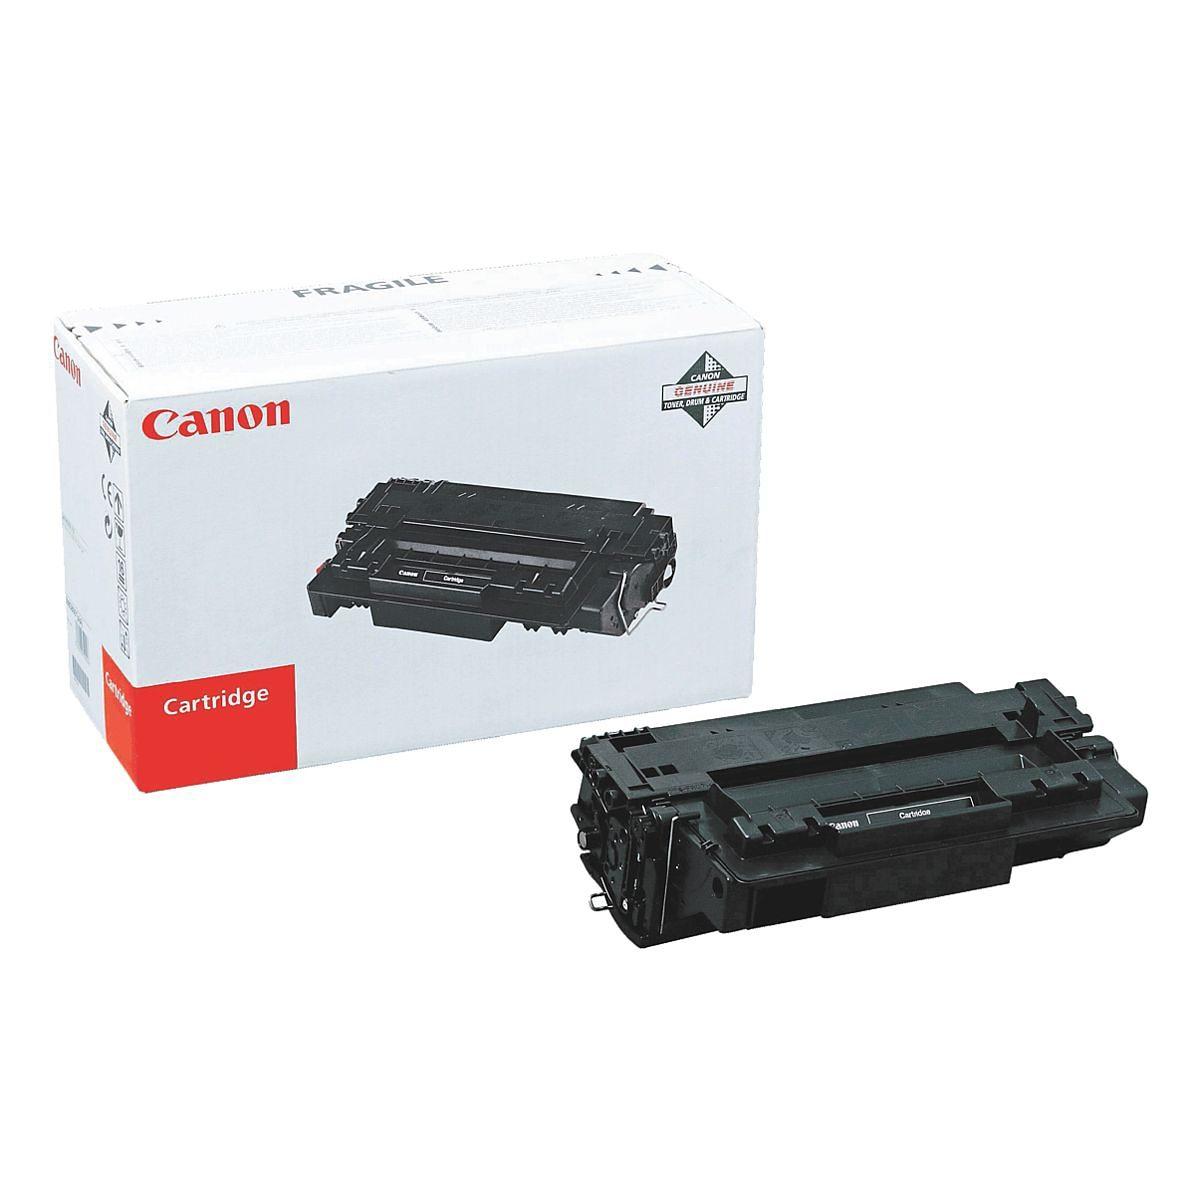 Canon Tonerpatrone »Cartridge 713«